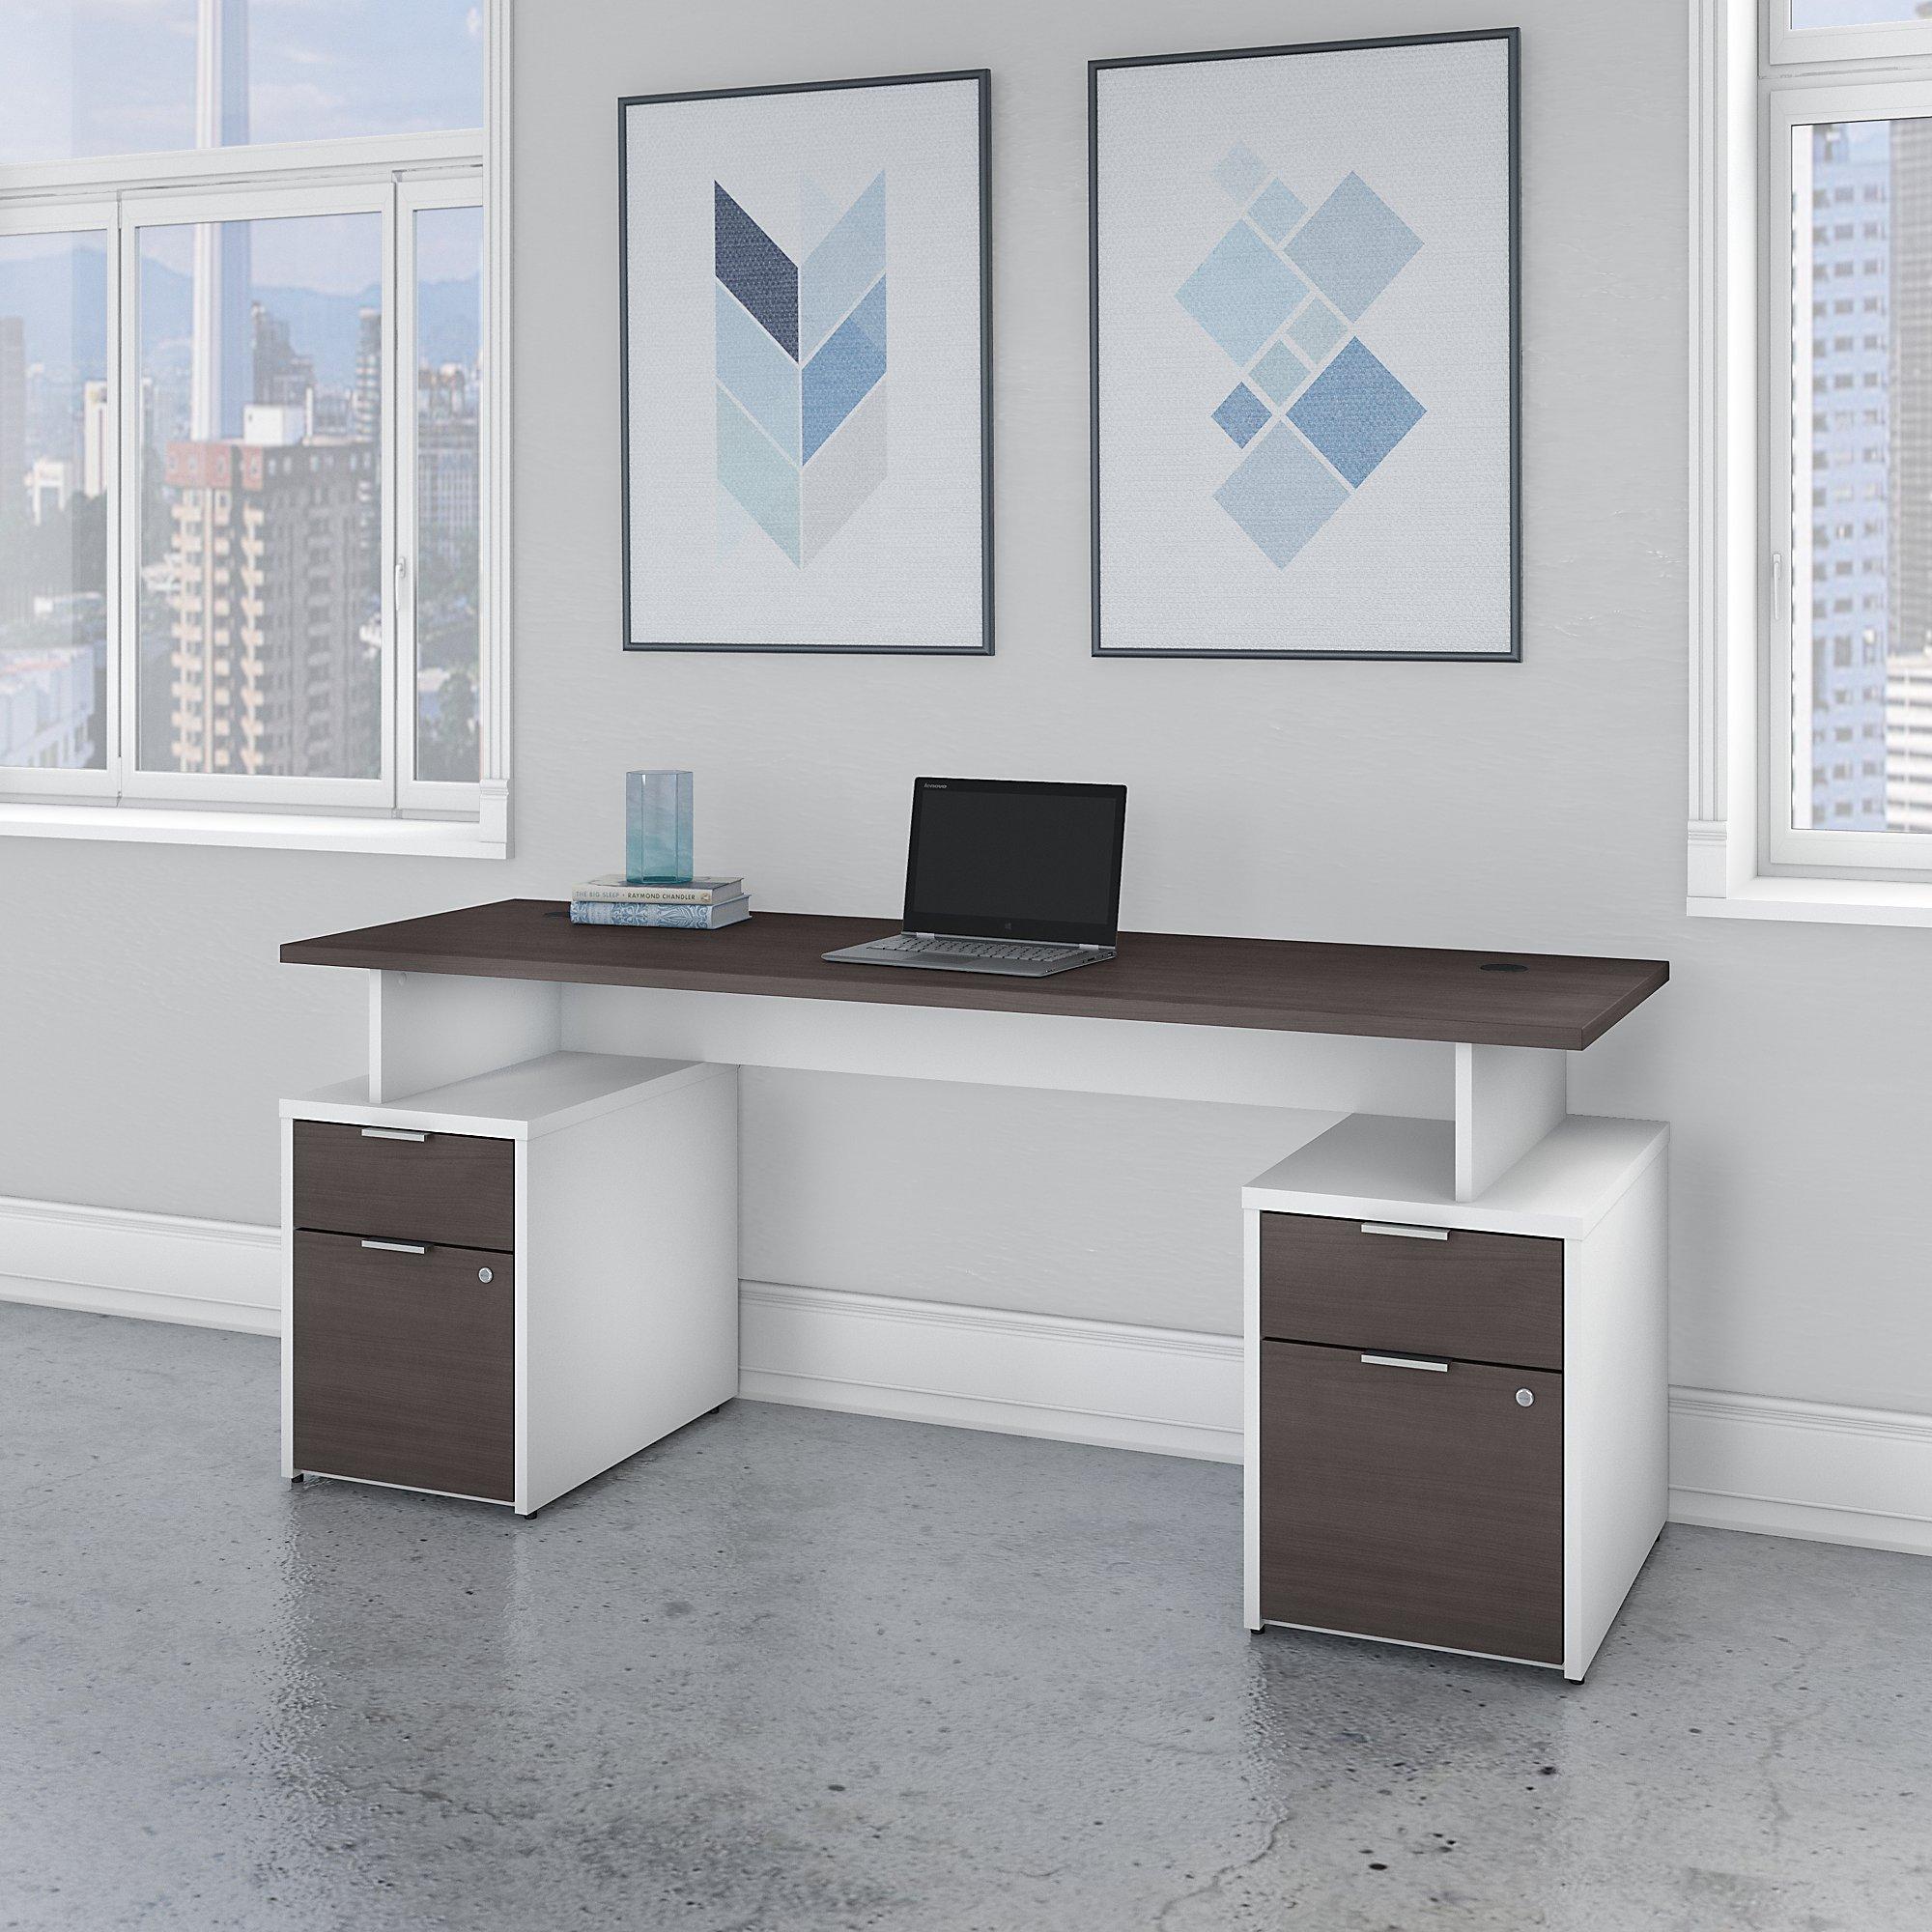 jtn005 storm gray and white jamestown desk